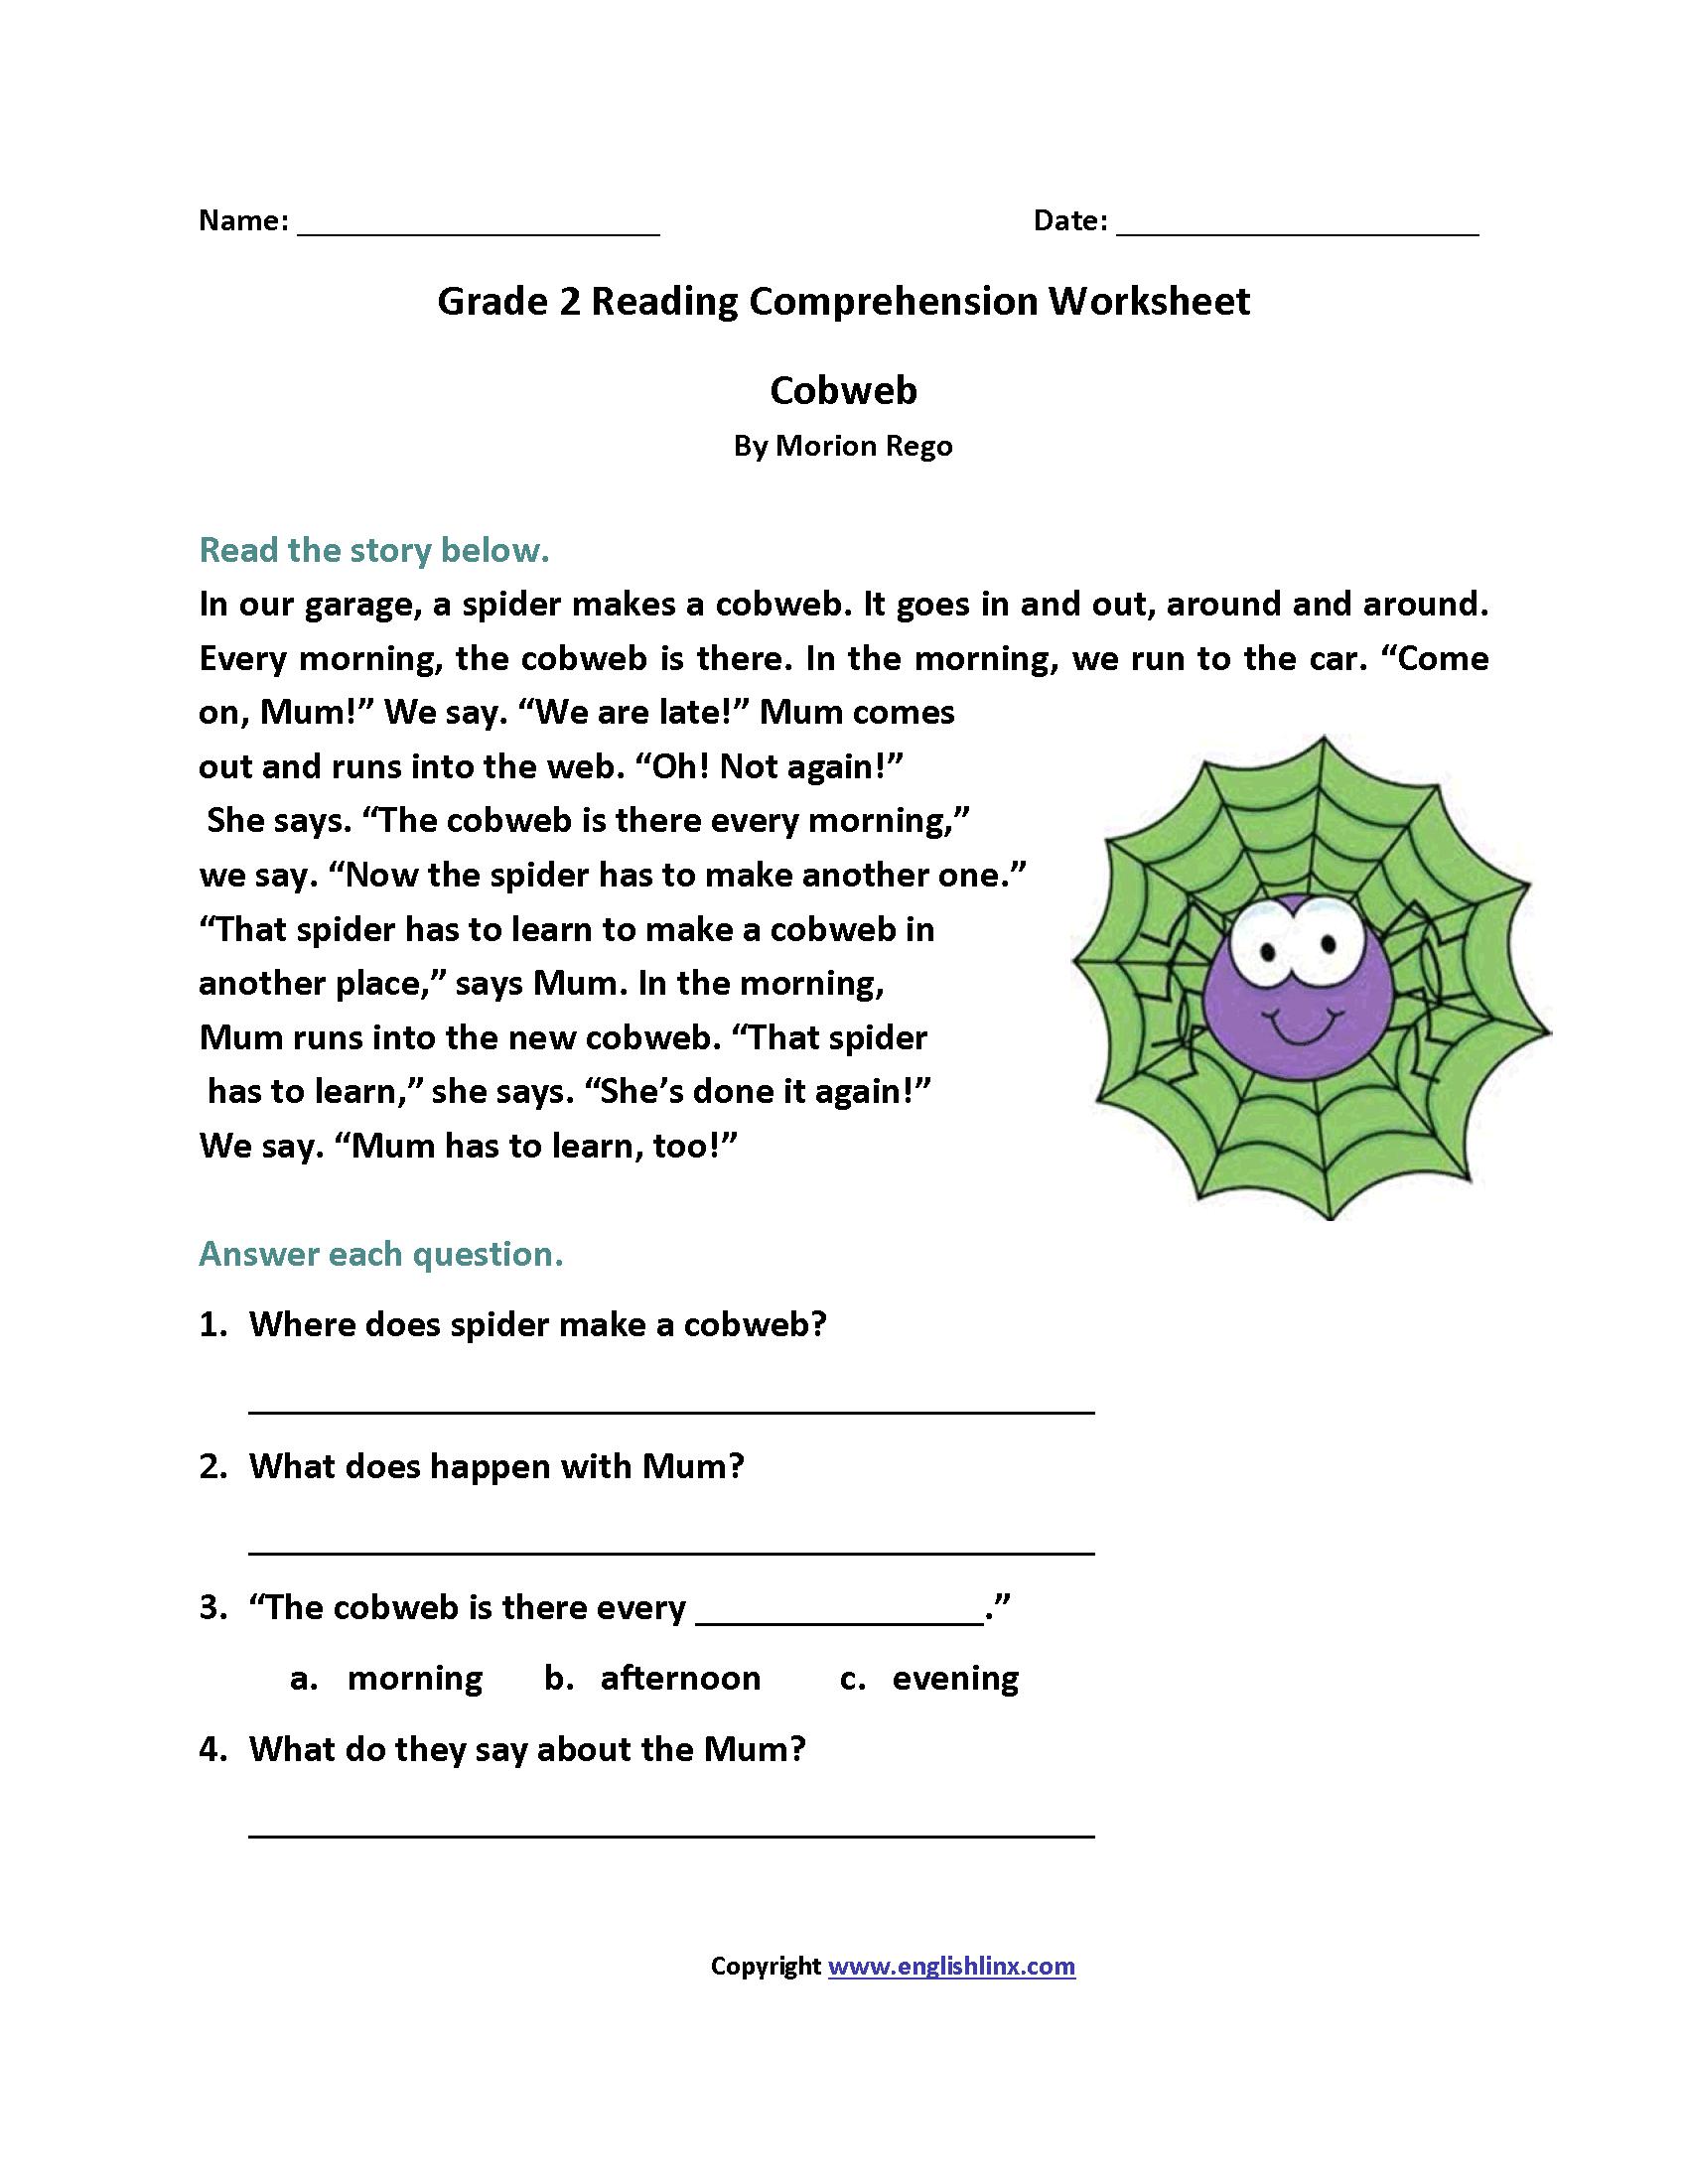 Cobweb Second Grade Reading Worksheets   2nd grade reading comprehension [ 2200 x 1700 Pixel ]